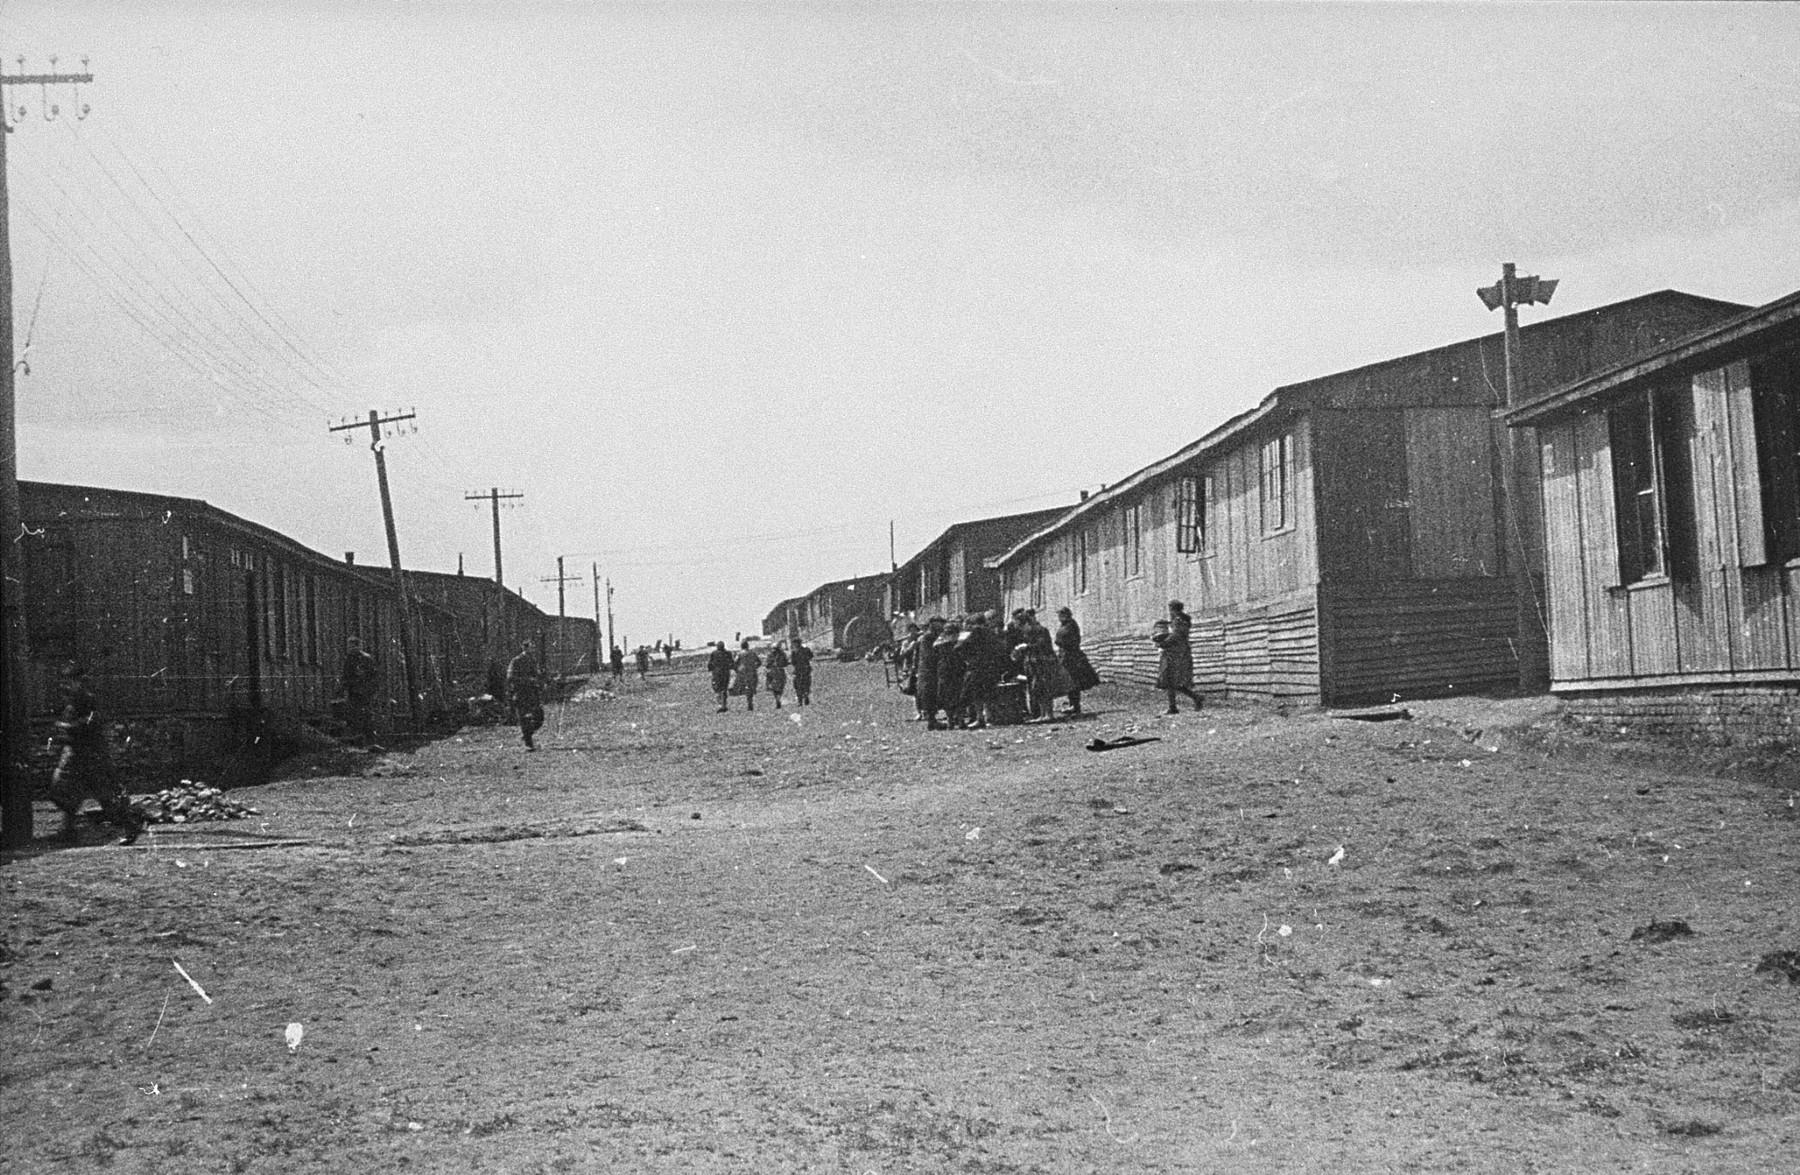 Jewish prisoners in Plaszow receive food.